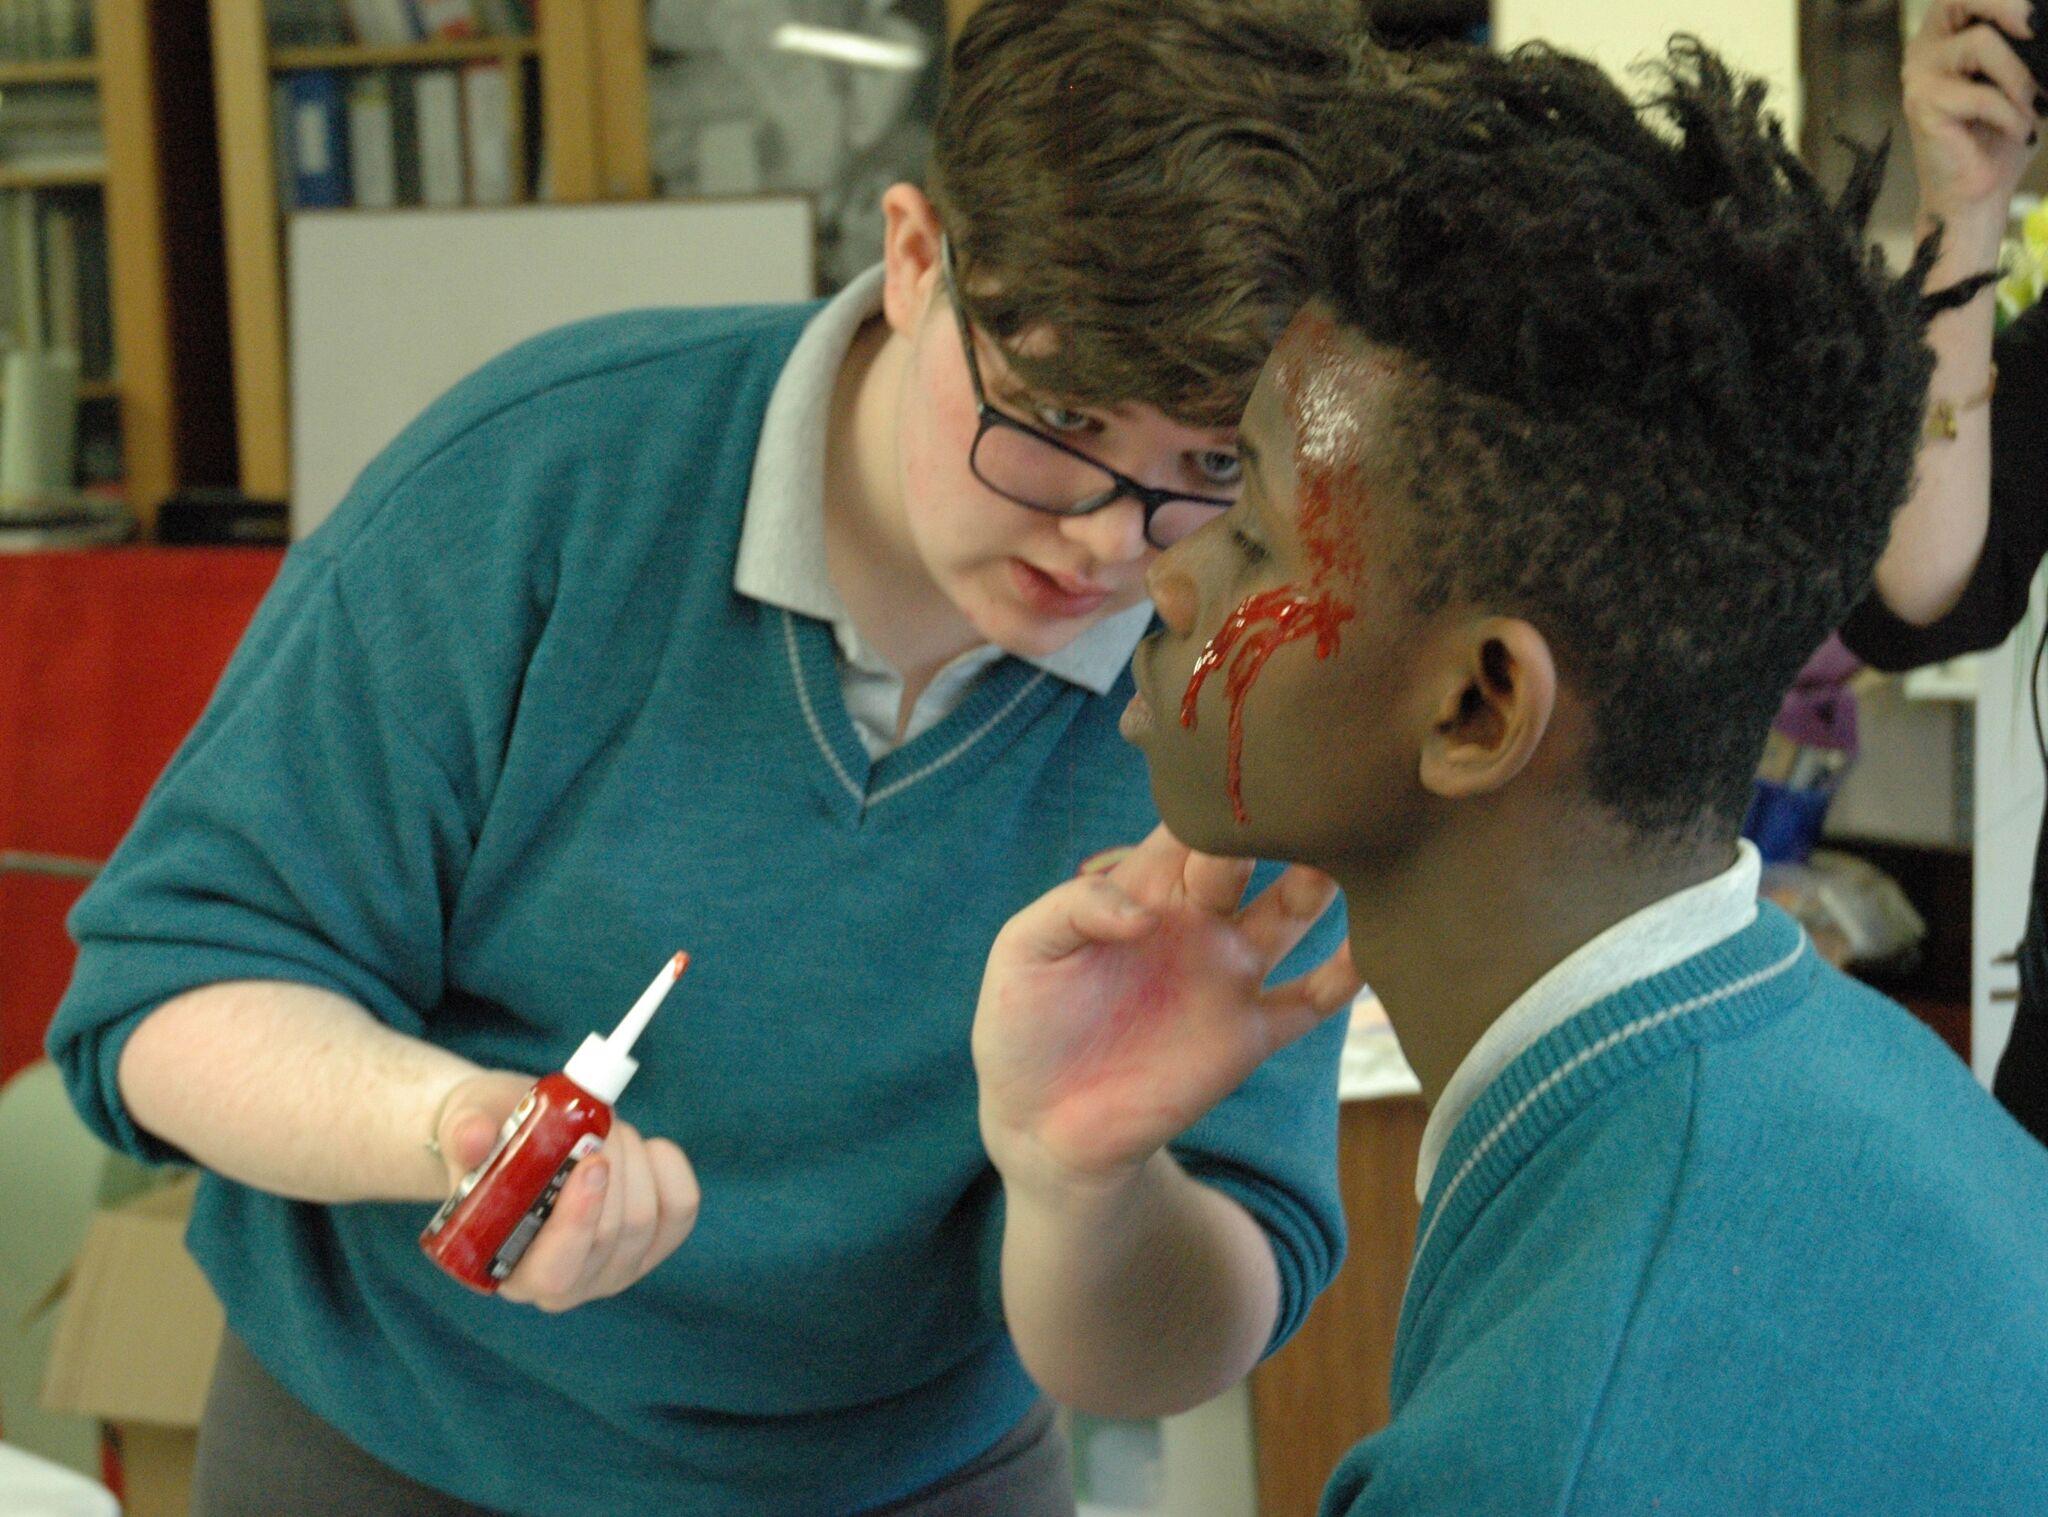 Cldoagh Emoe 2 make-up.jpg